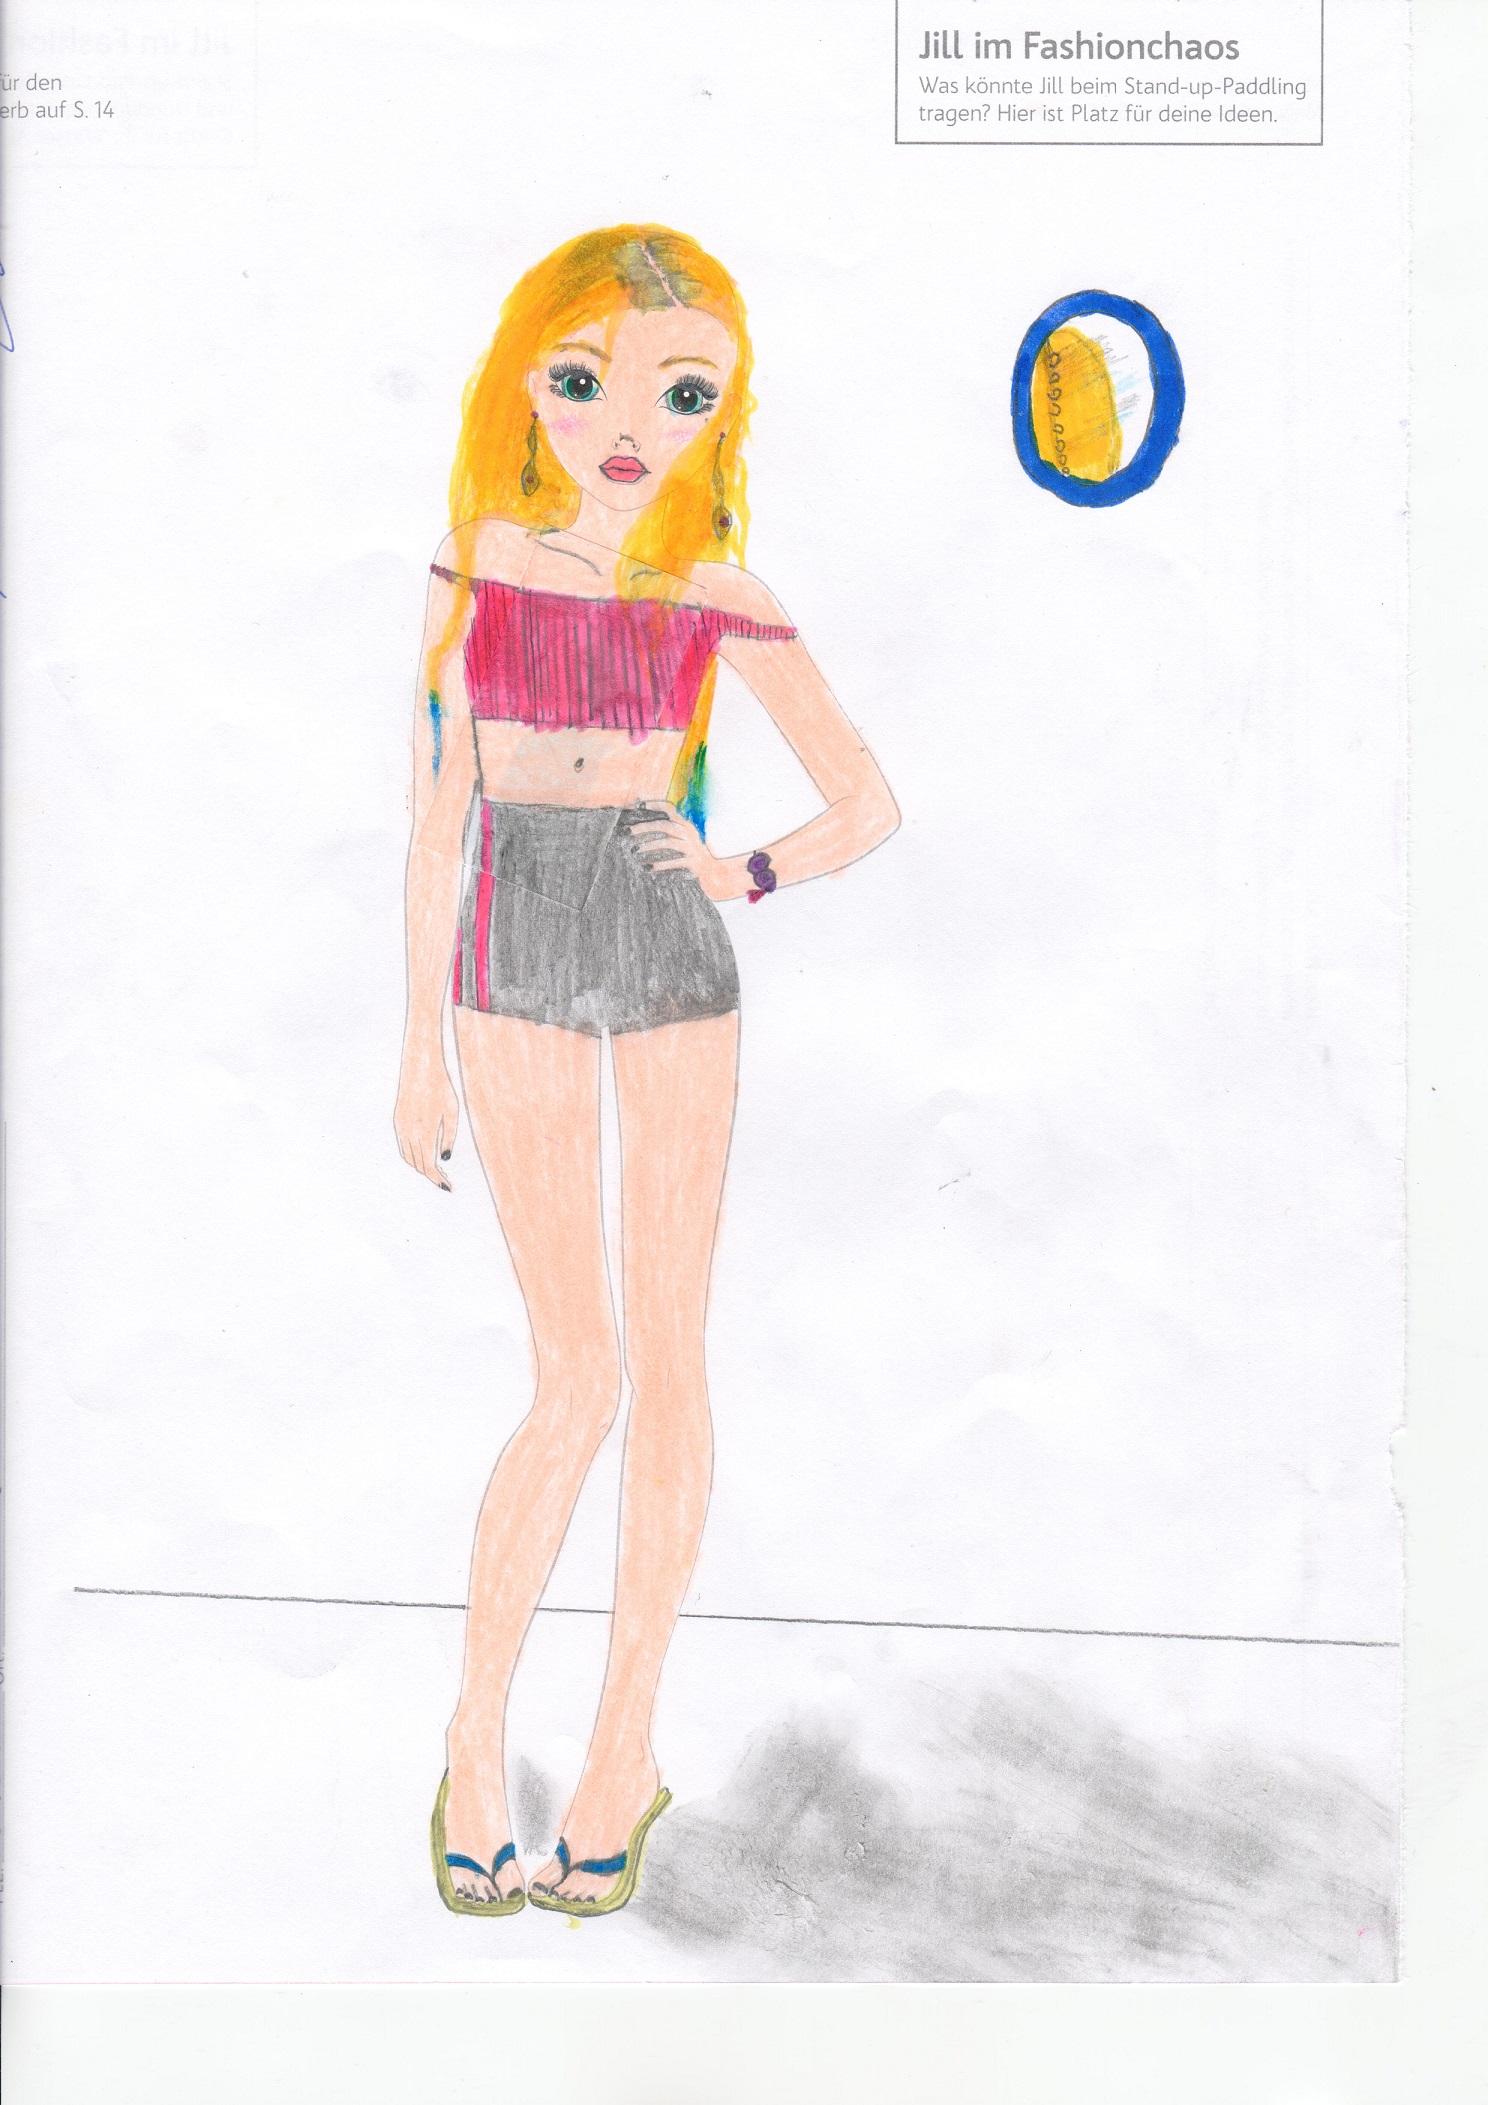 Tamara Sophie S., 10 Jahre, aus Quickborn